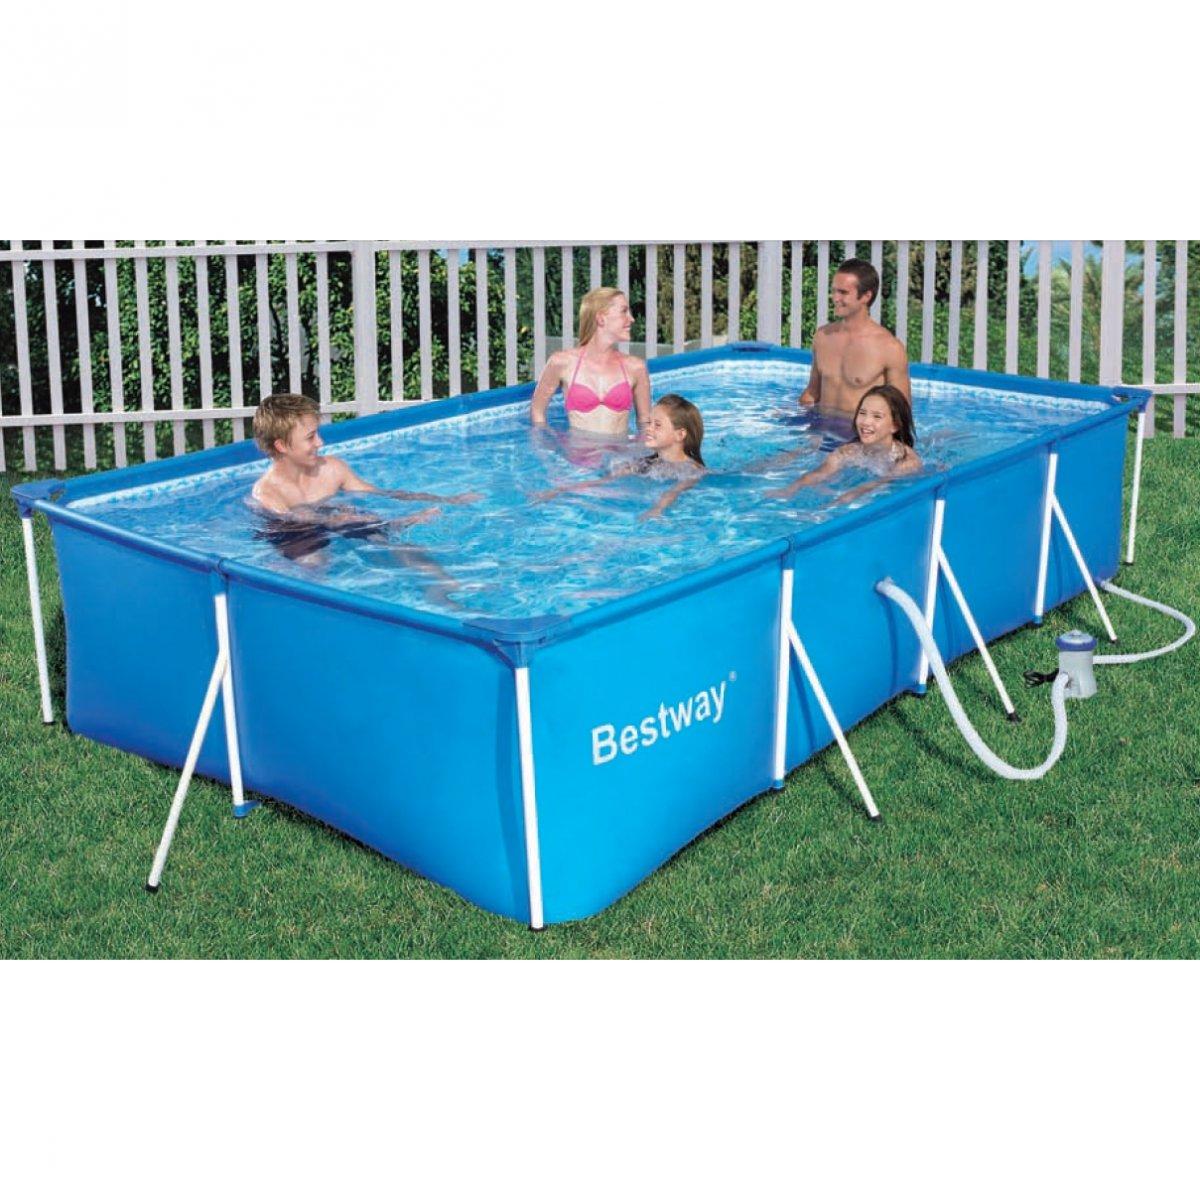 Bestway piscina rettangolare 400x211x81 56082 bestway for Bestway piscine e accessori